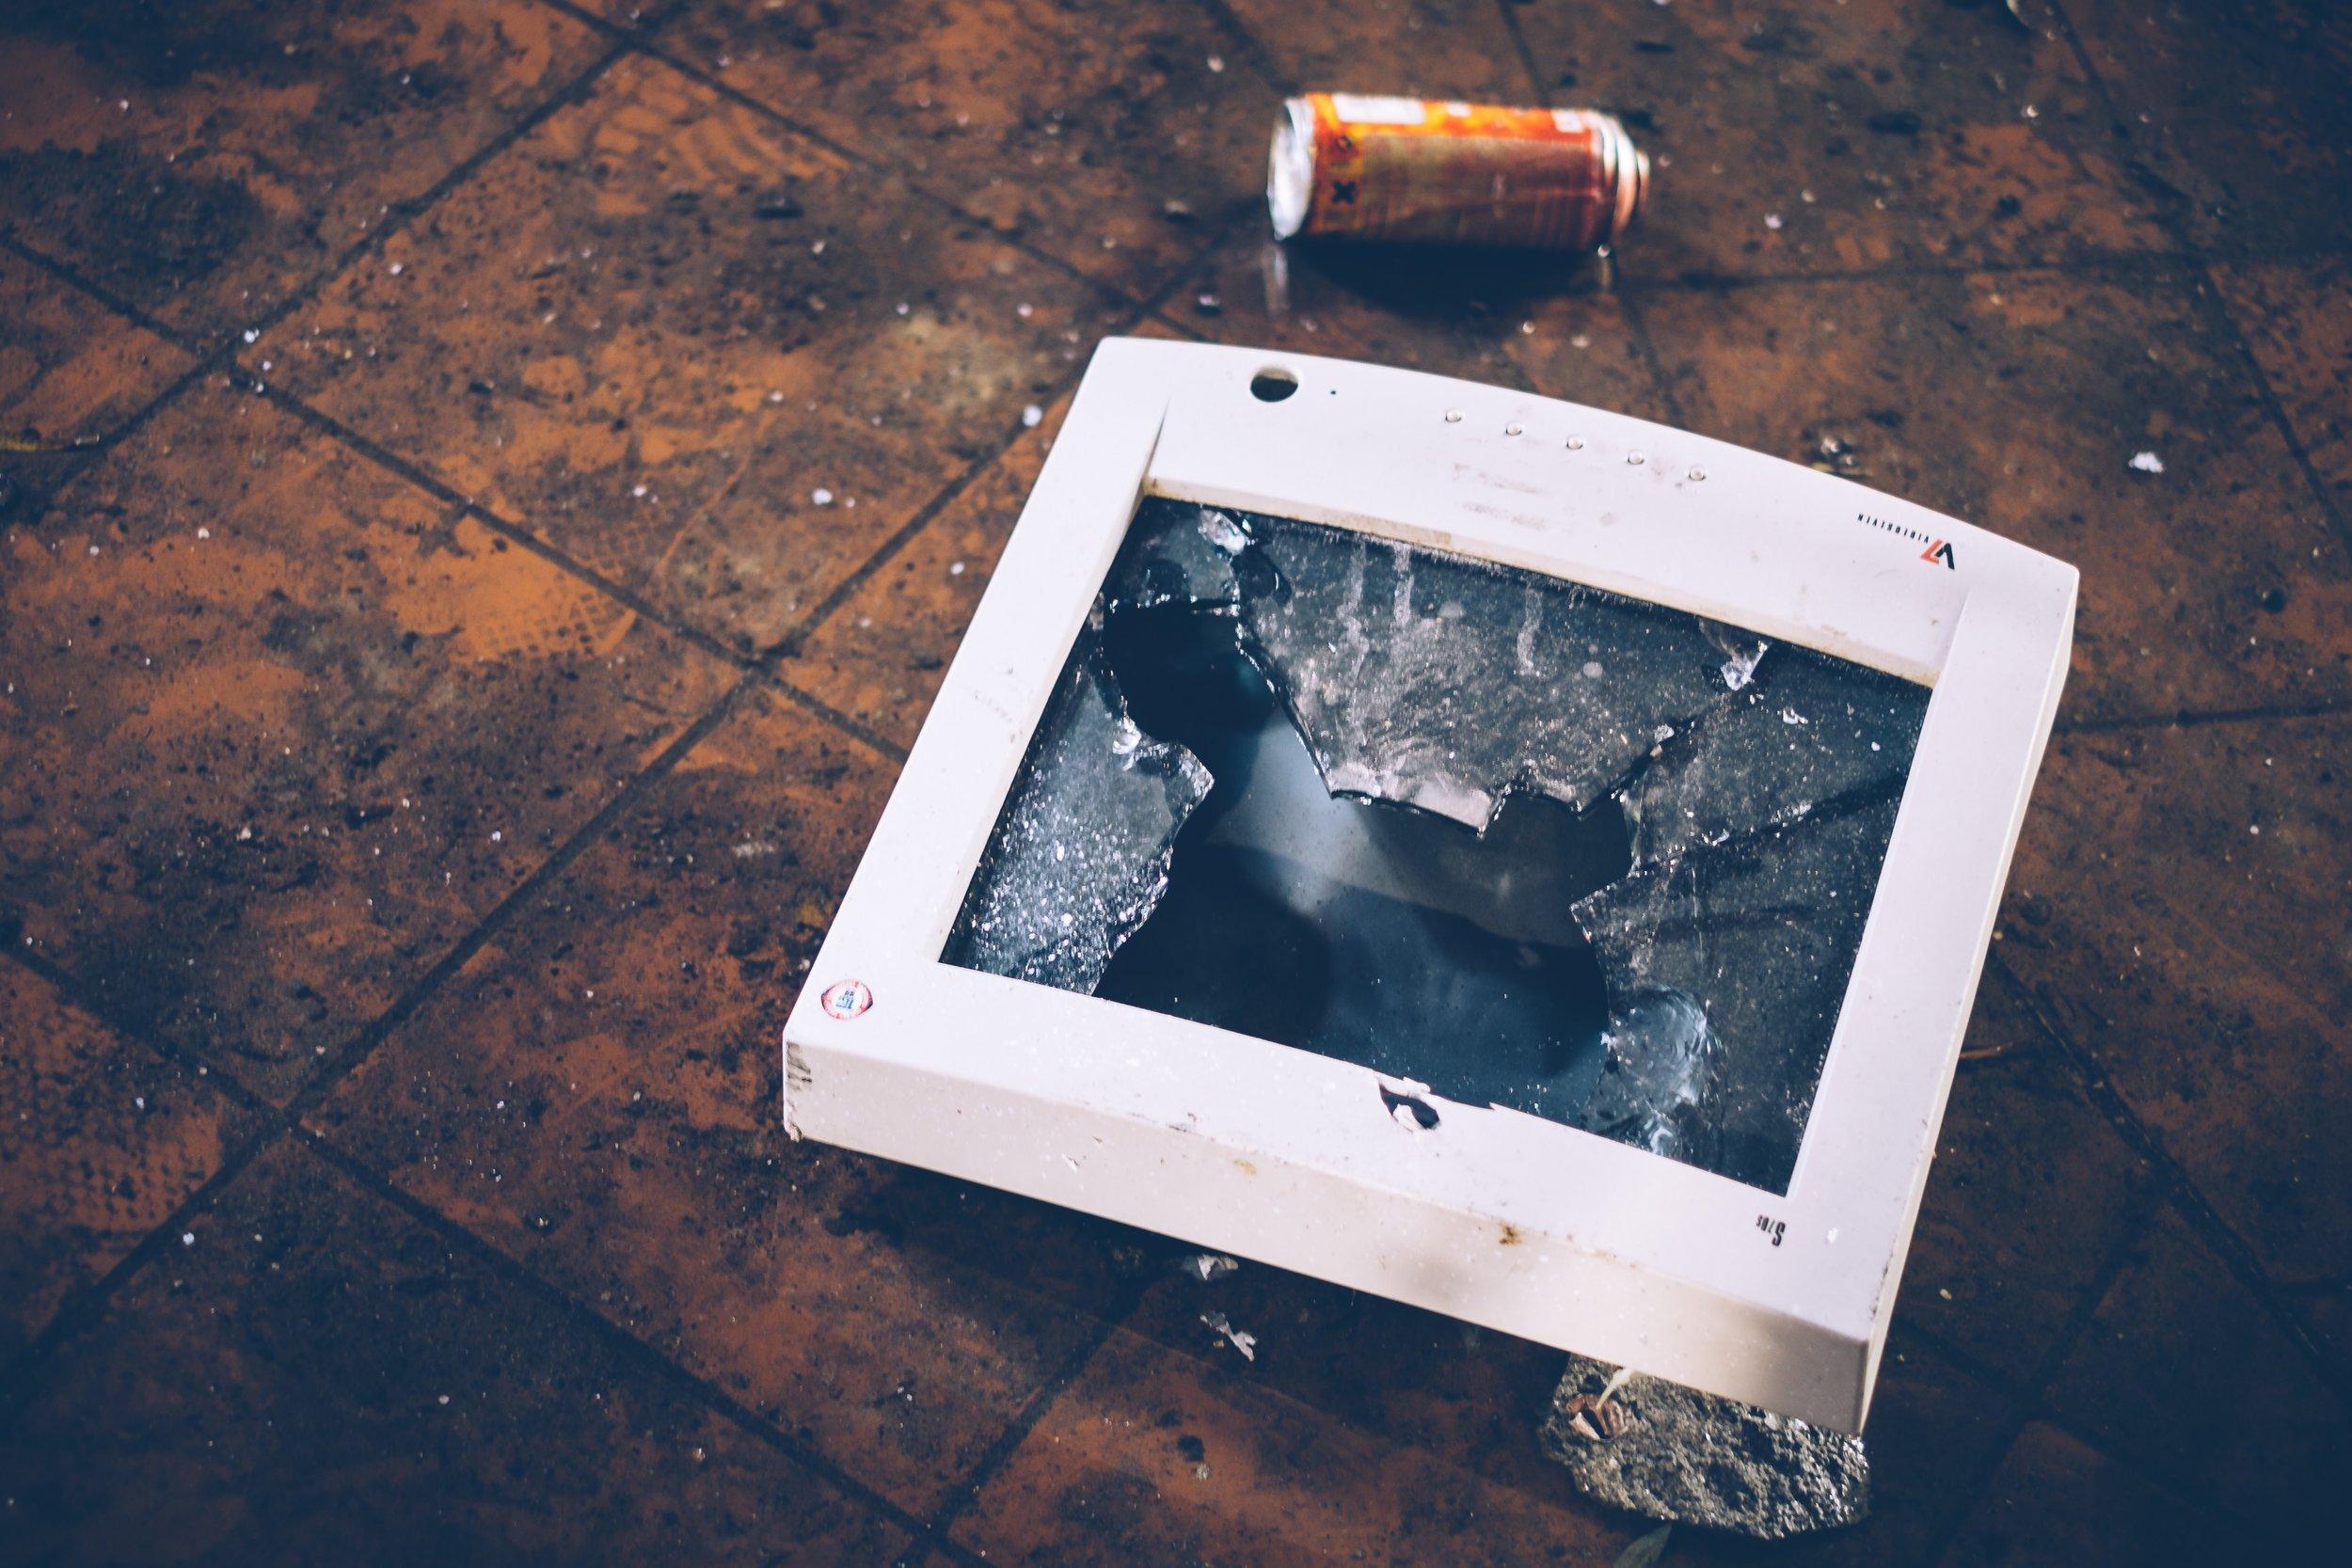 simson-petrol-133138 crime criminal smashed.jpg